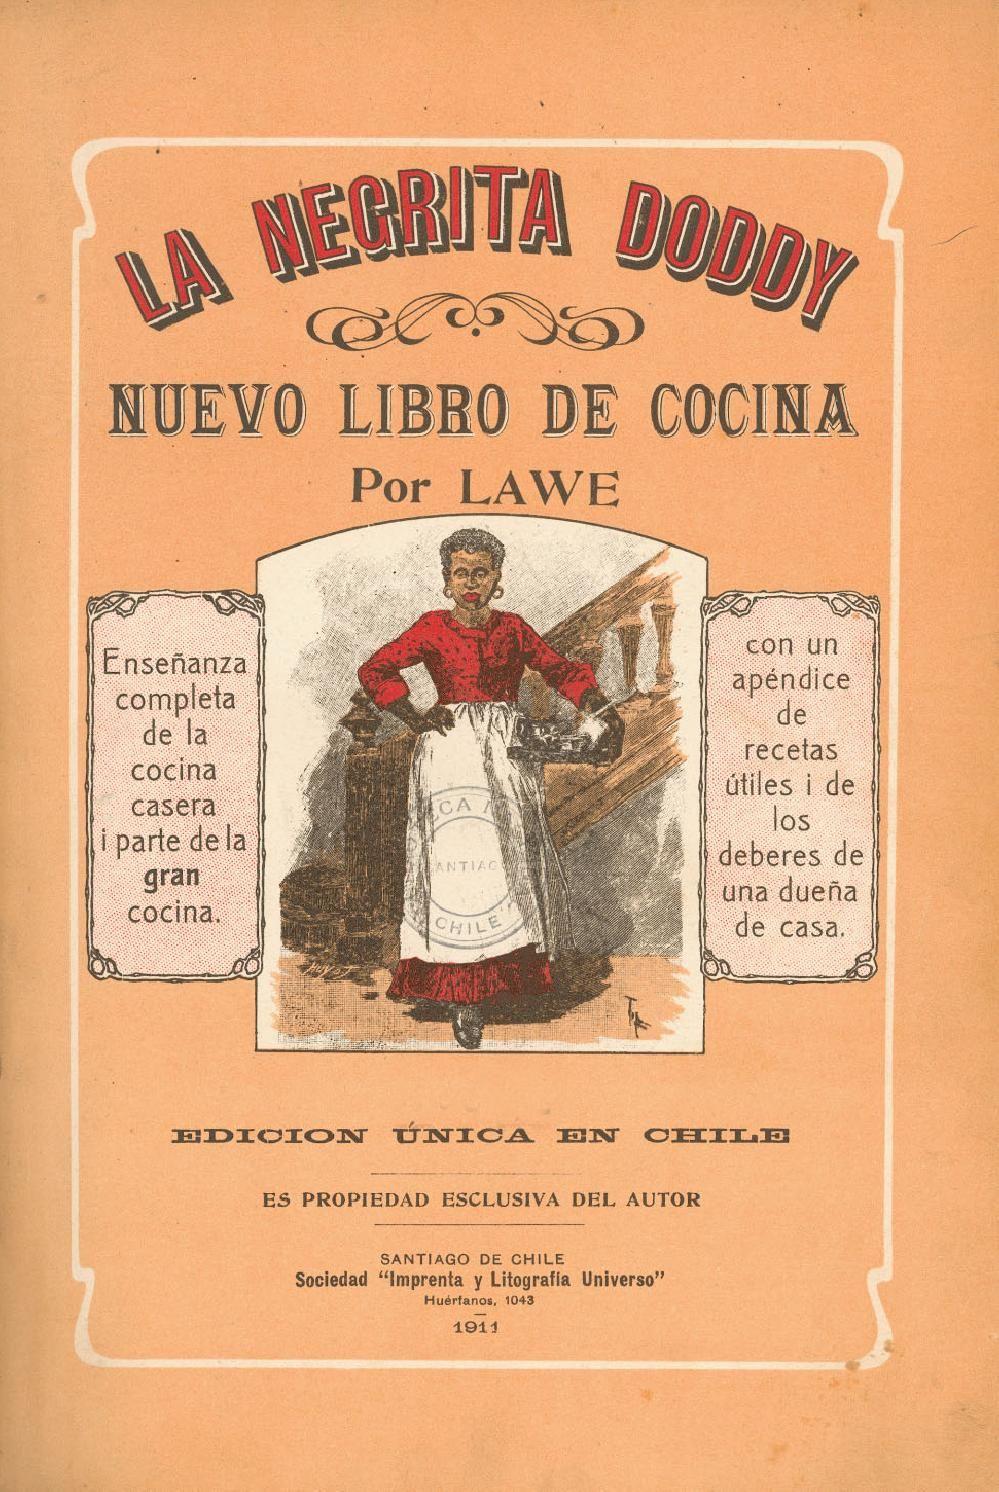 Recetas De La Negrita Doddy Books Vintage Cookbooks Recipe Book